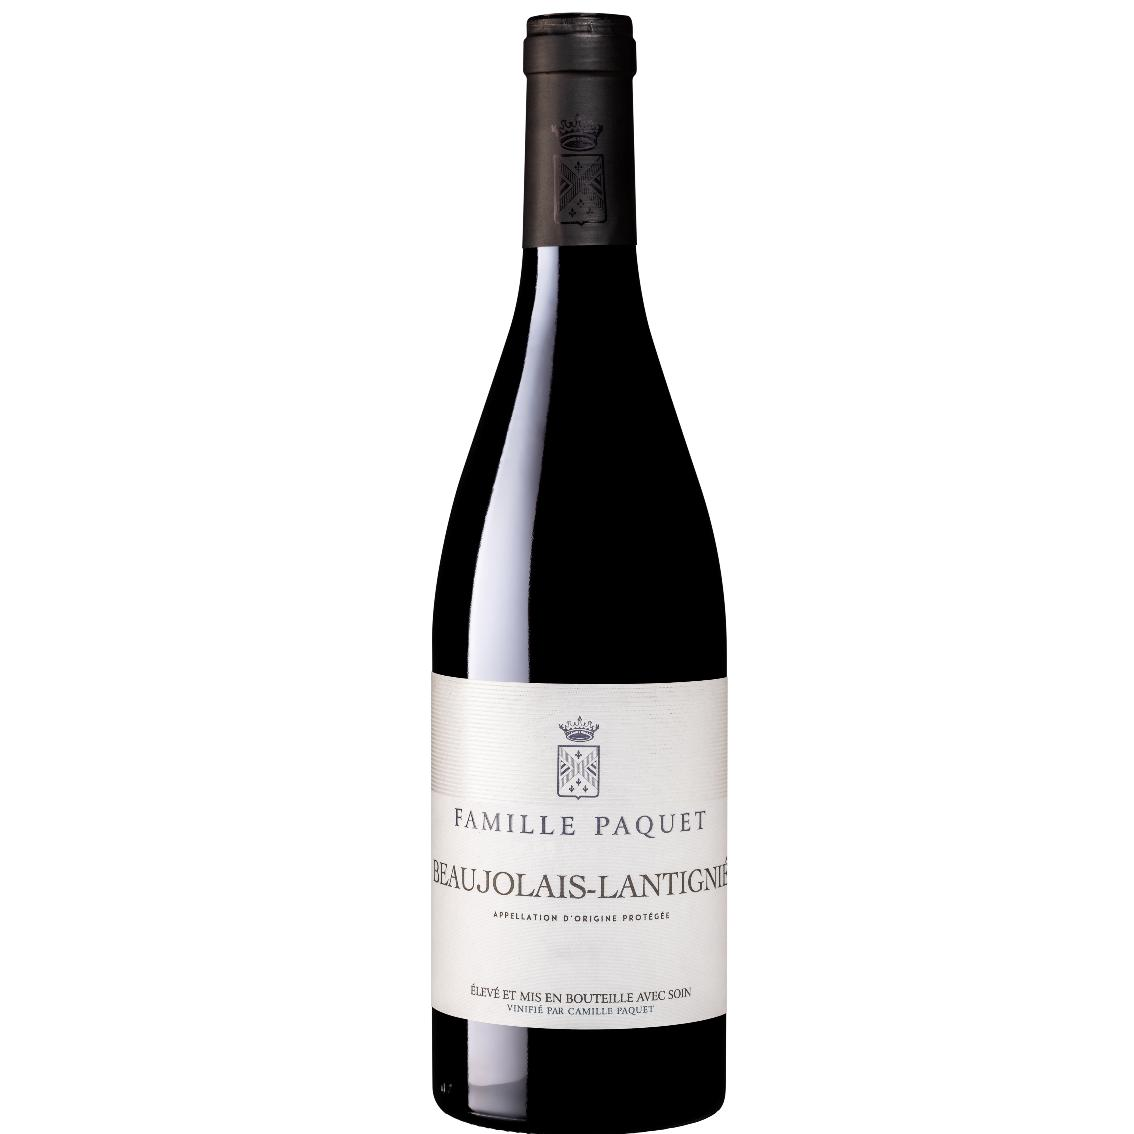 2019 Beaujolais Lantigné - Famille Paquet